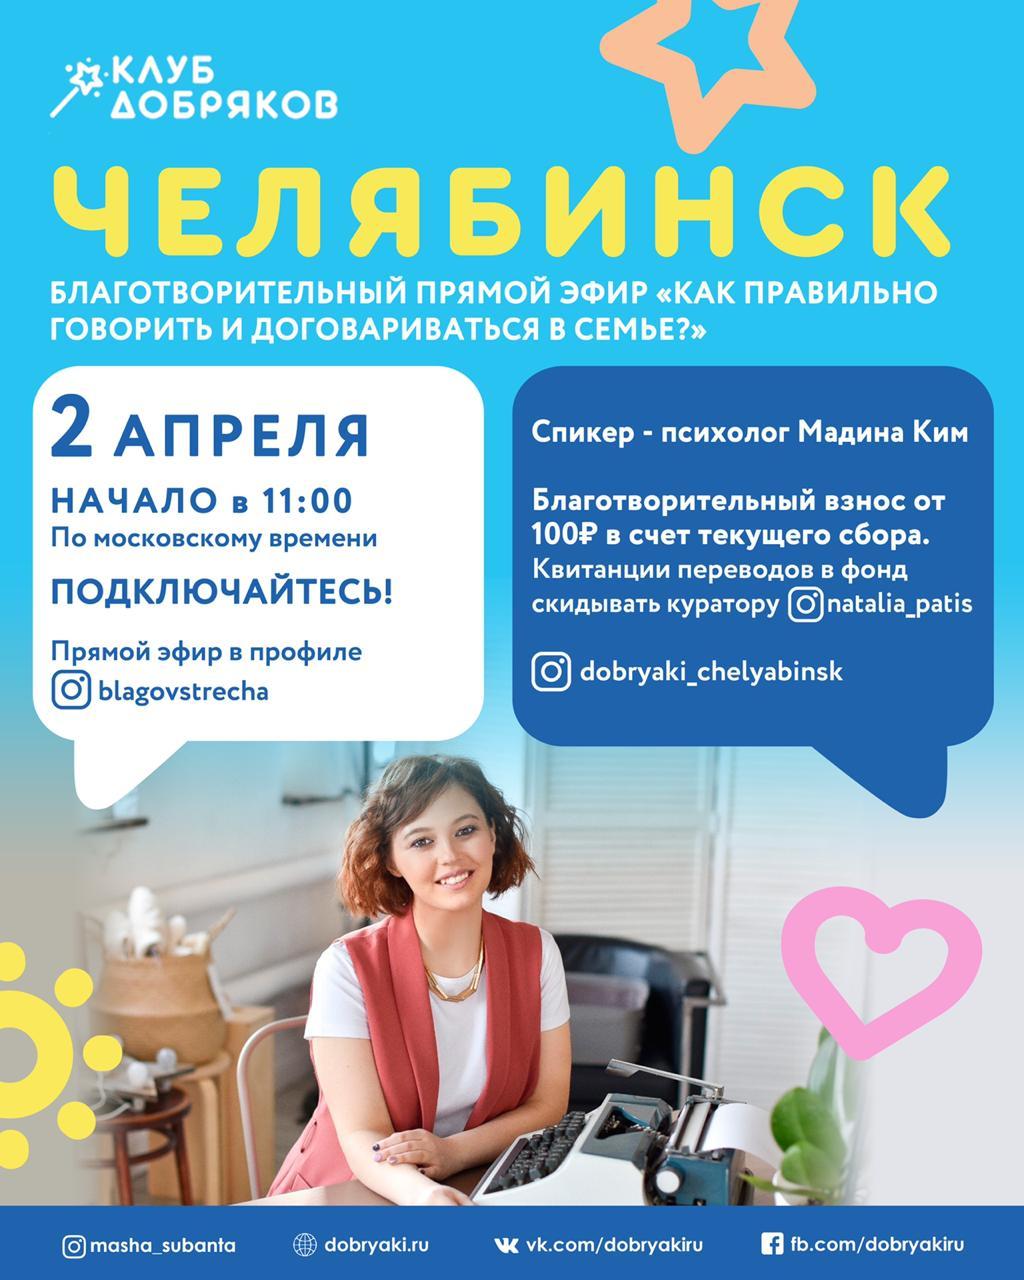 Добряки Челябинска проведут благовстречу онлайн